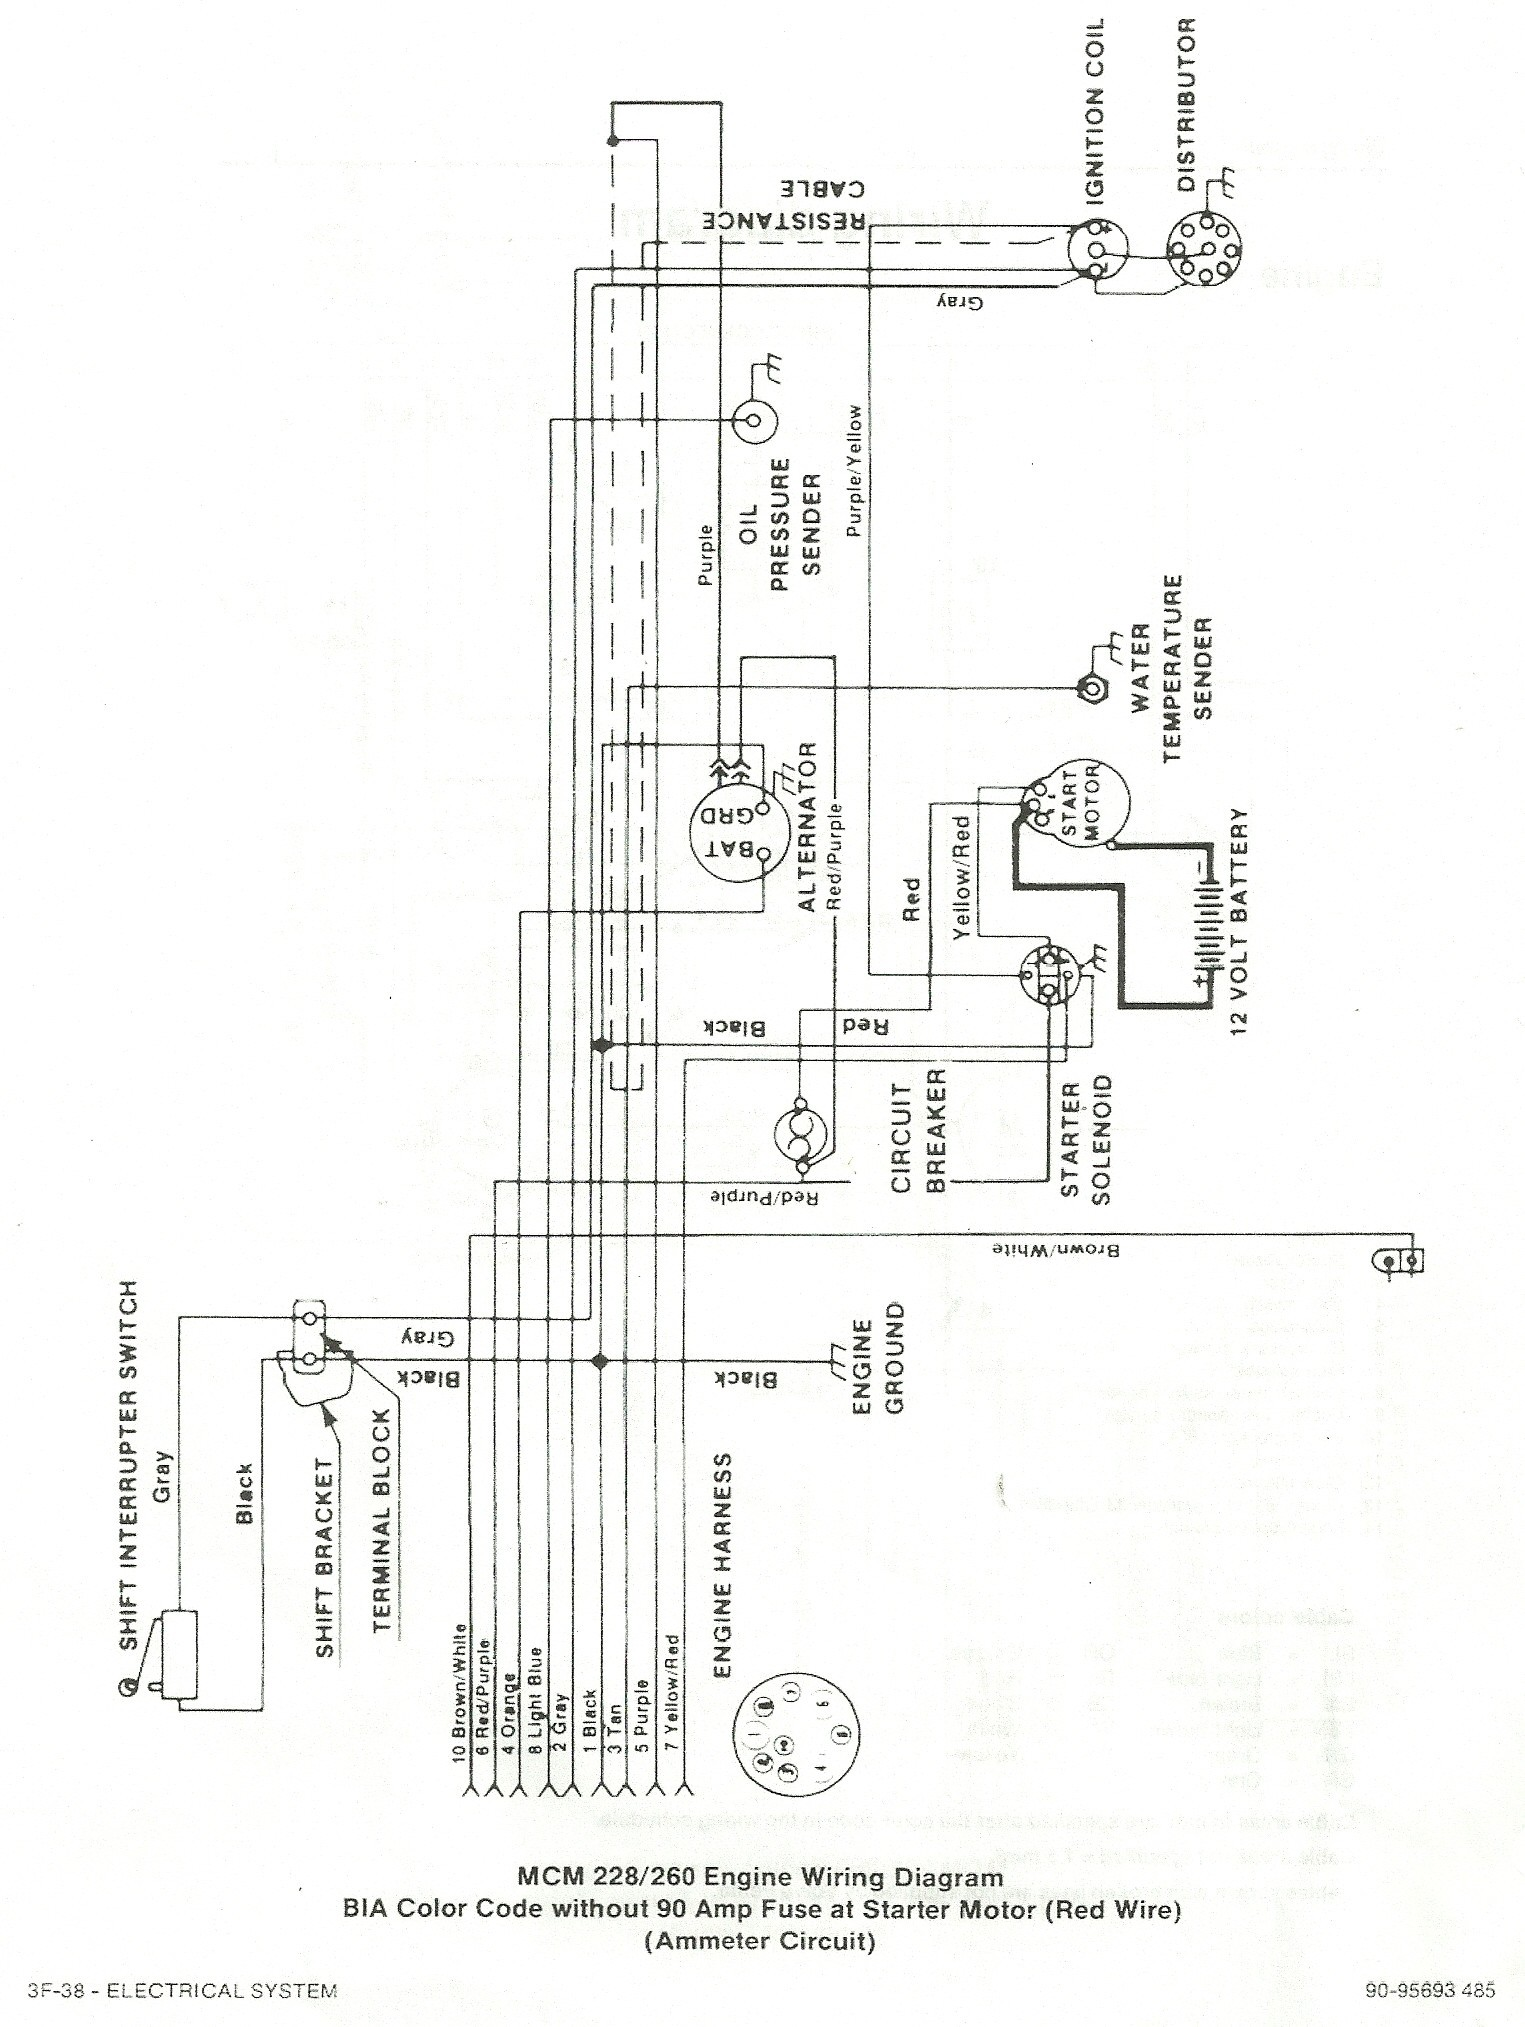 hight resolution of mercury trim pump wiring diagram